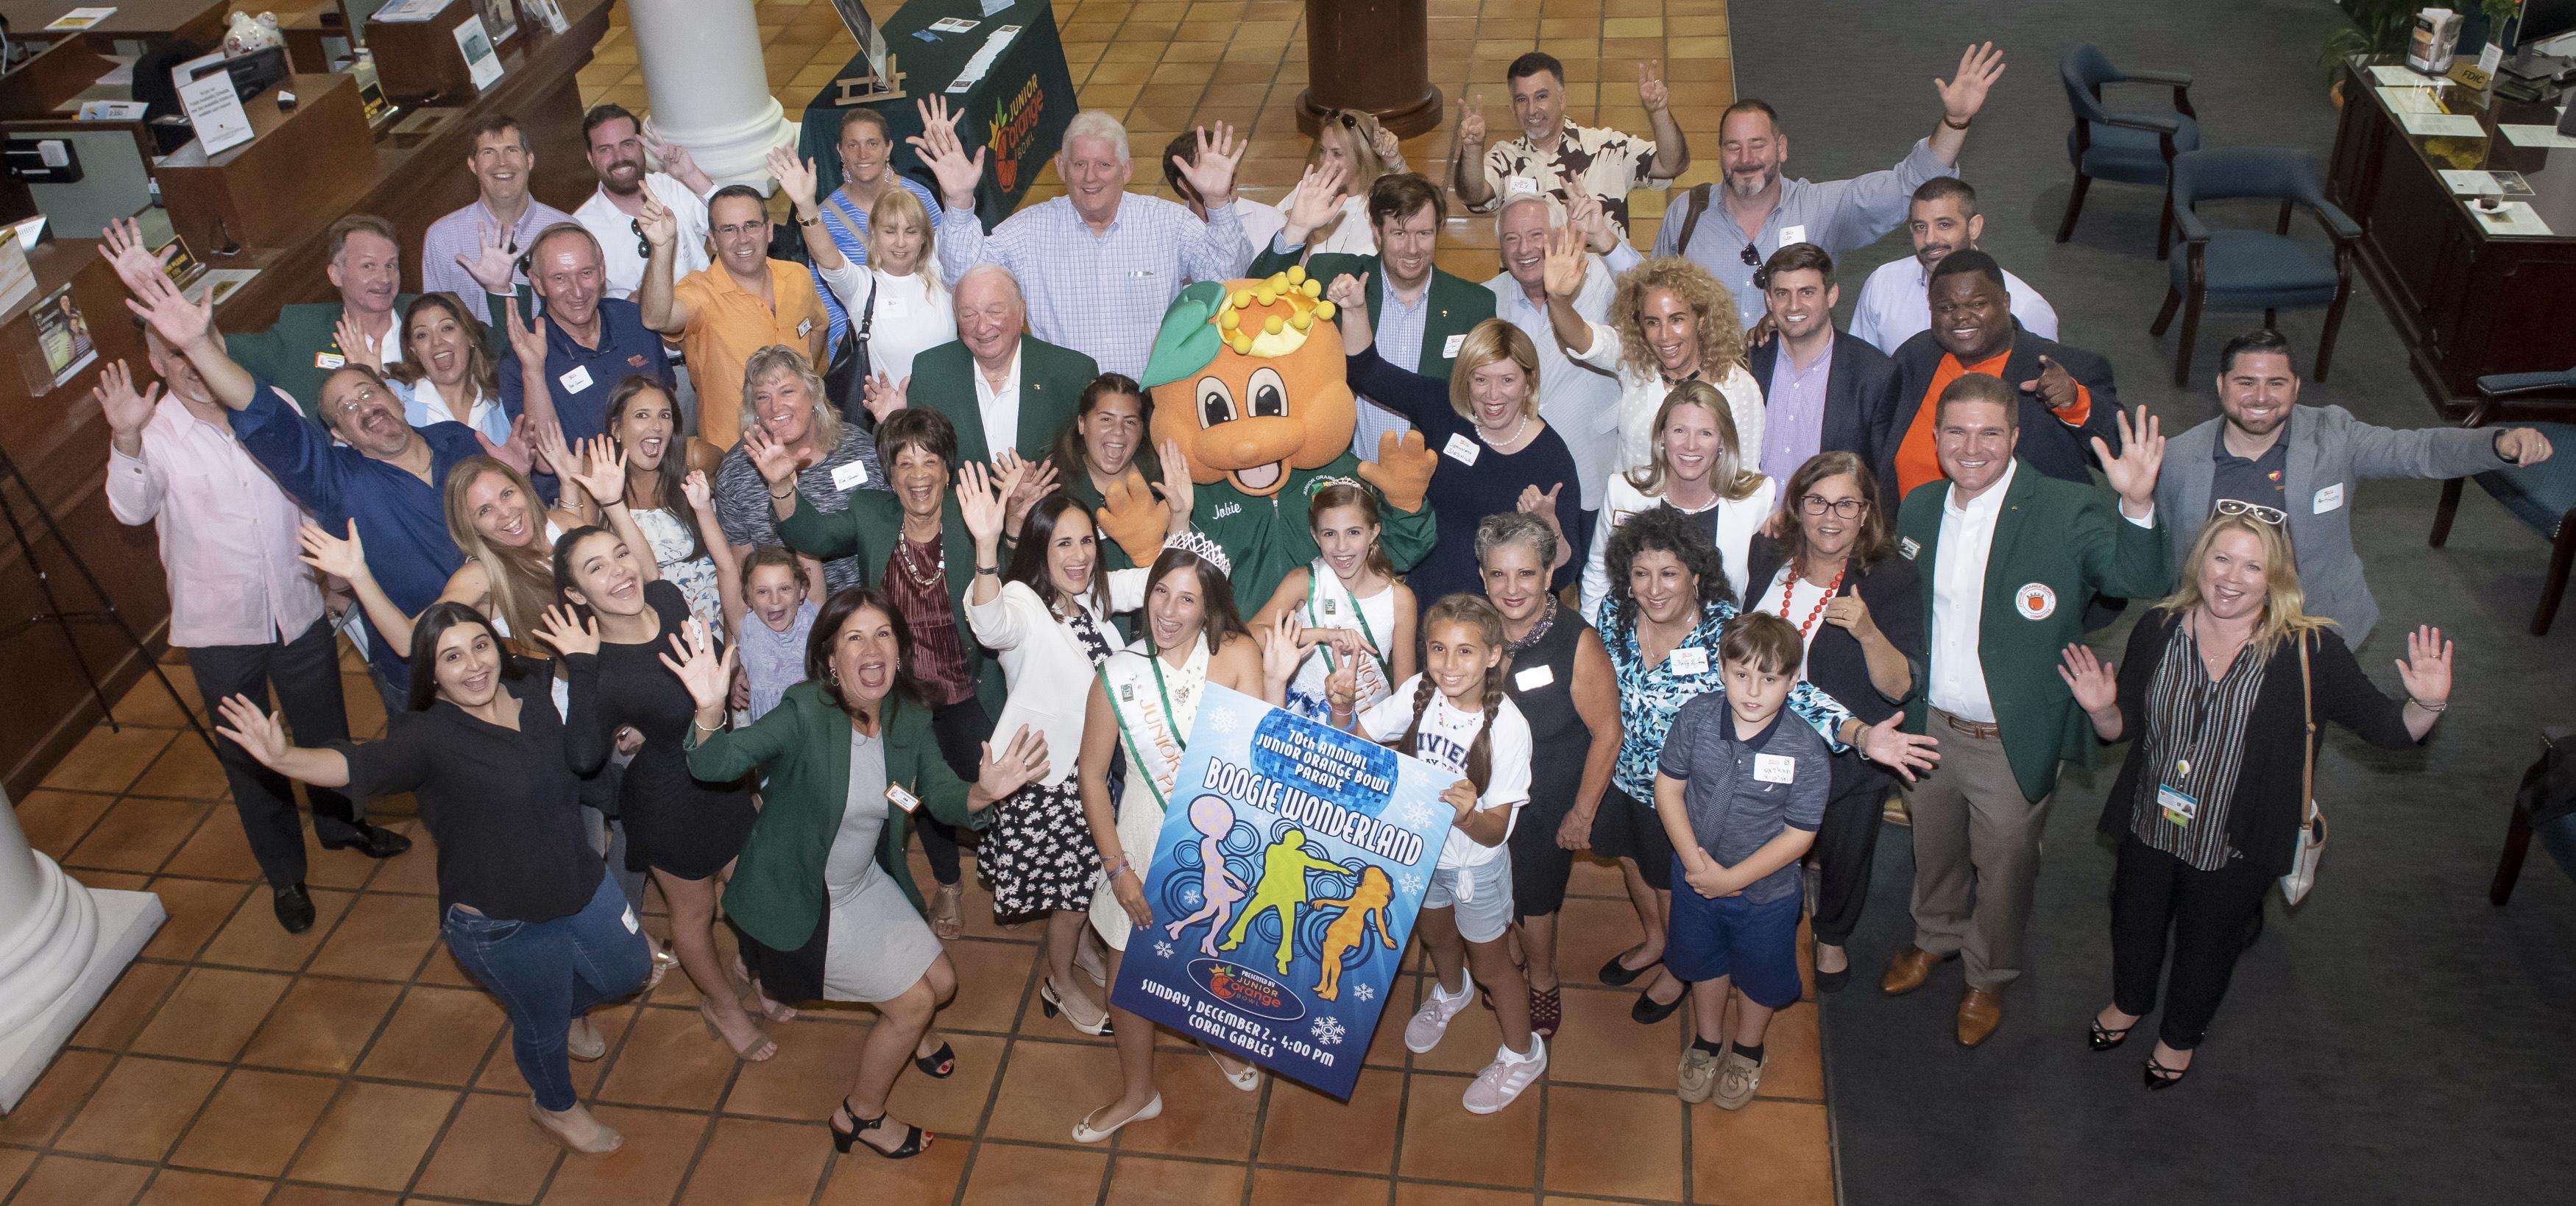 Junior Orange Bowl Unveils 70th Annual Parade Theme - Boogie Wonderland